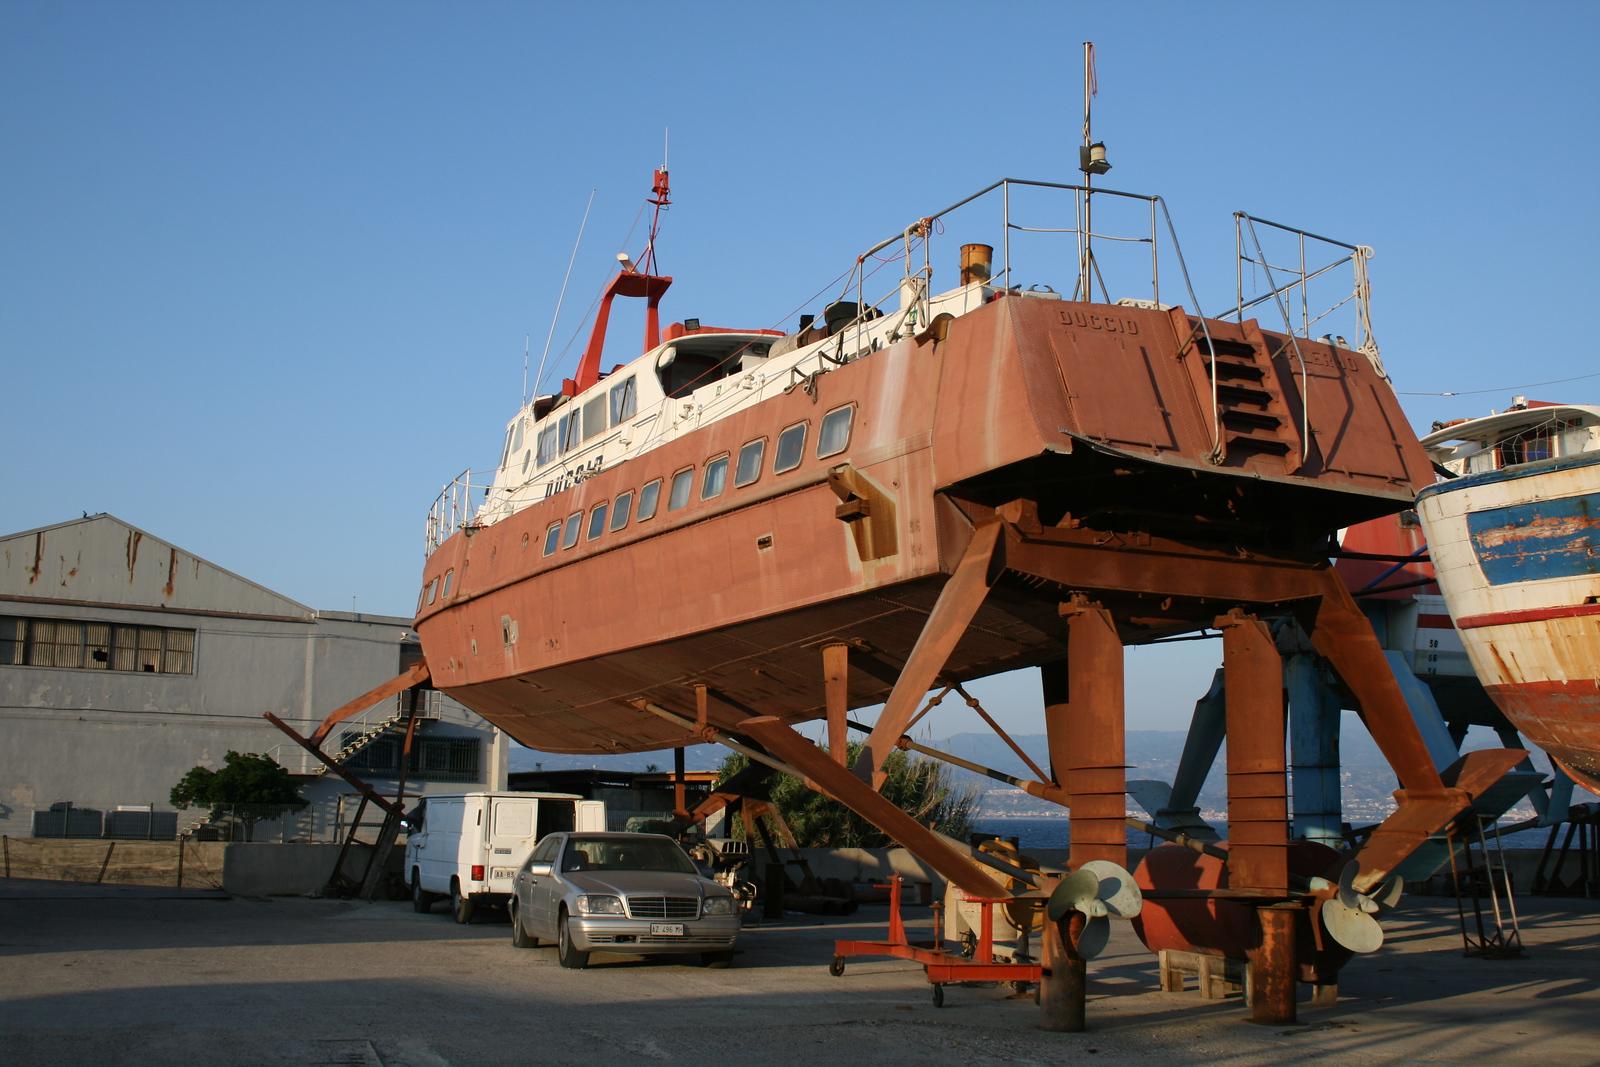 2009 - Hydrofoil DUCCIO laid up in dry dock in Messina.